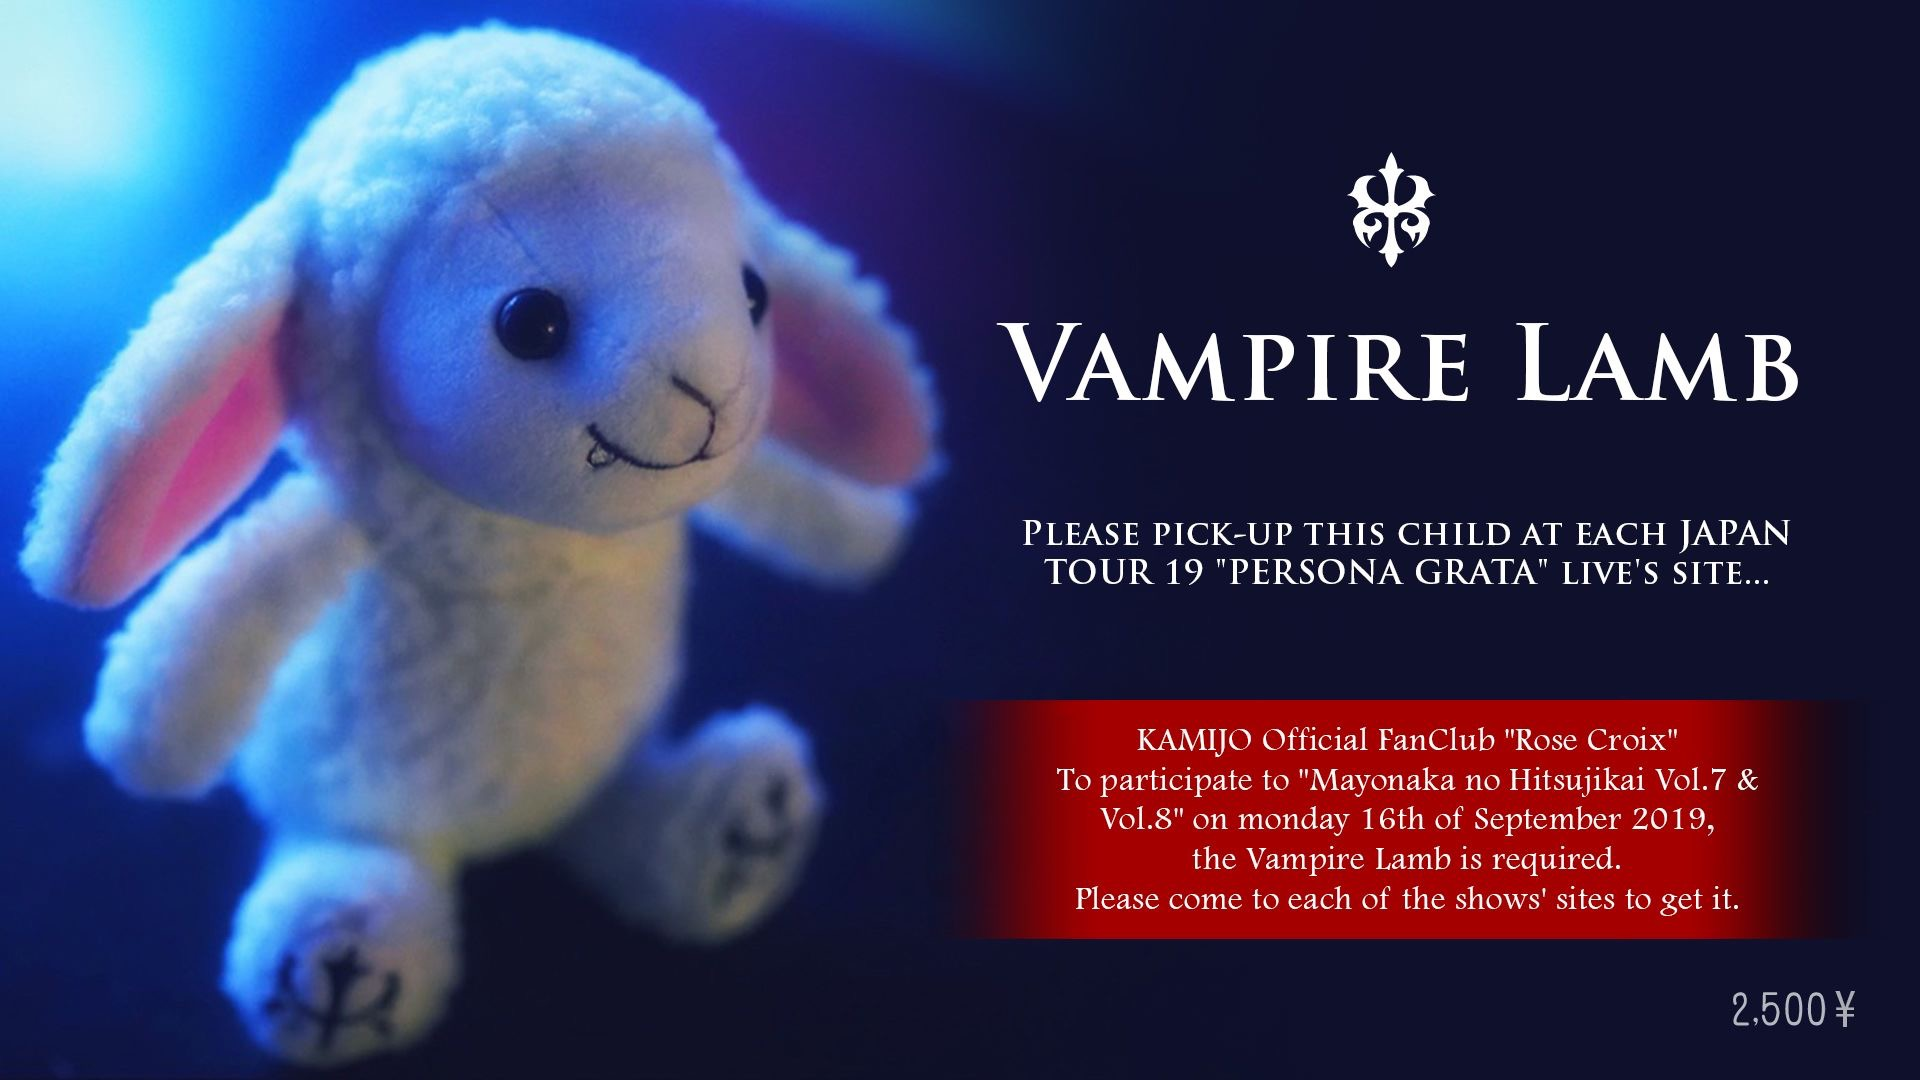 VAMPIRE LAMB, fanclub news